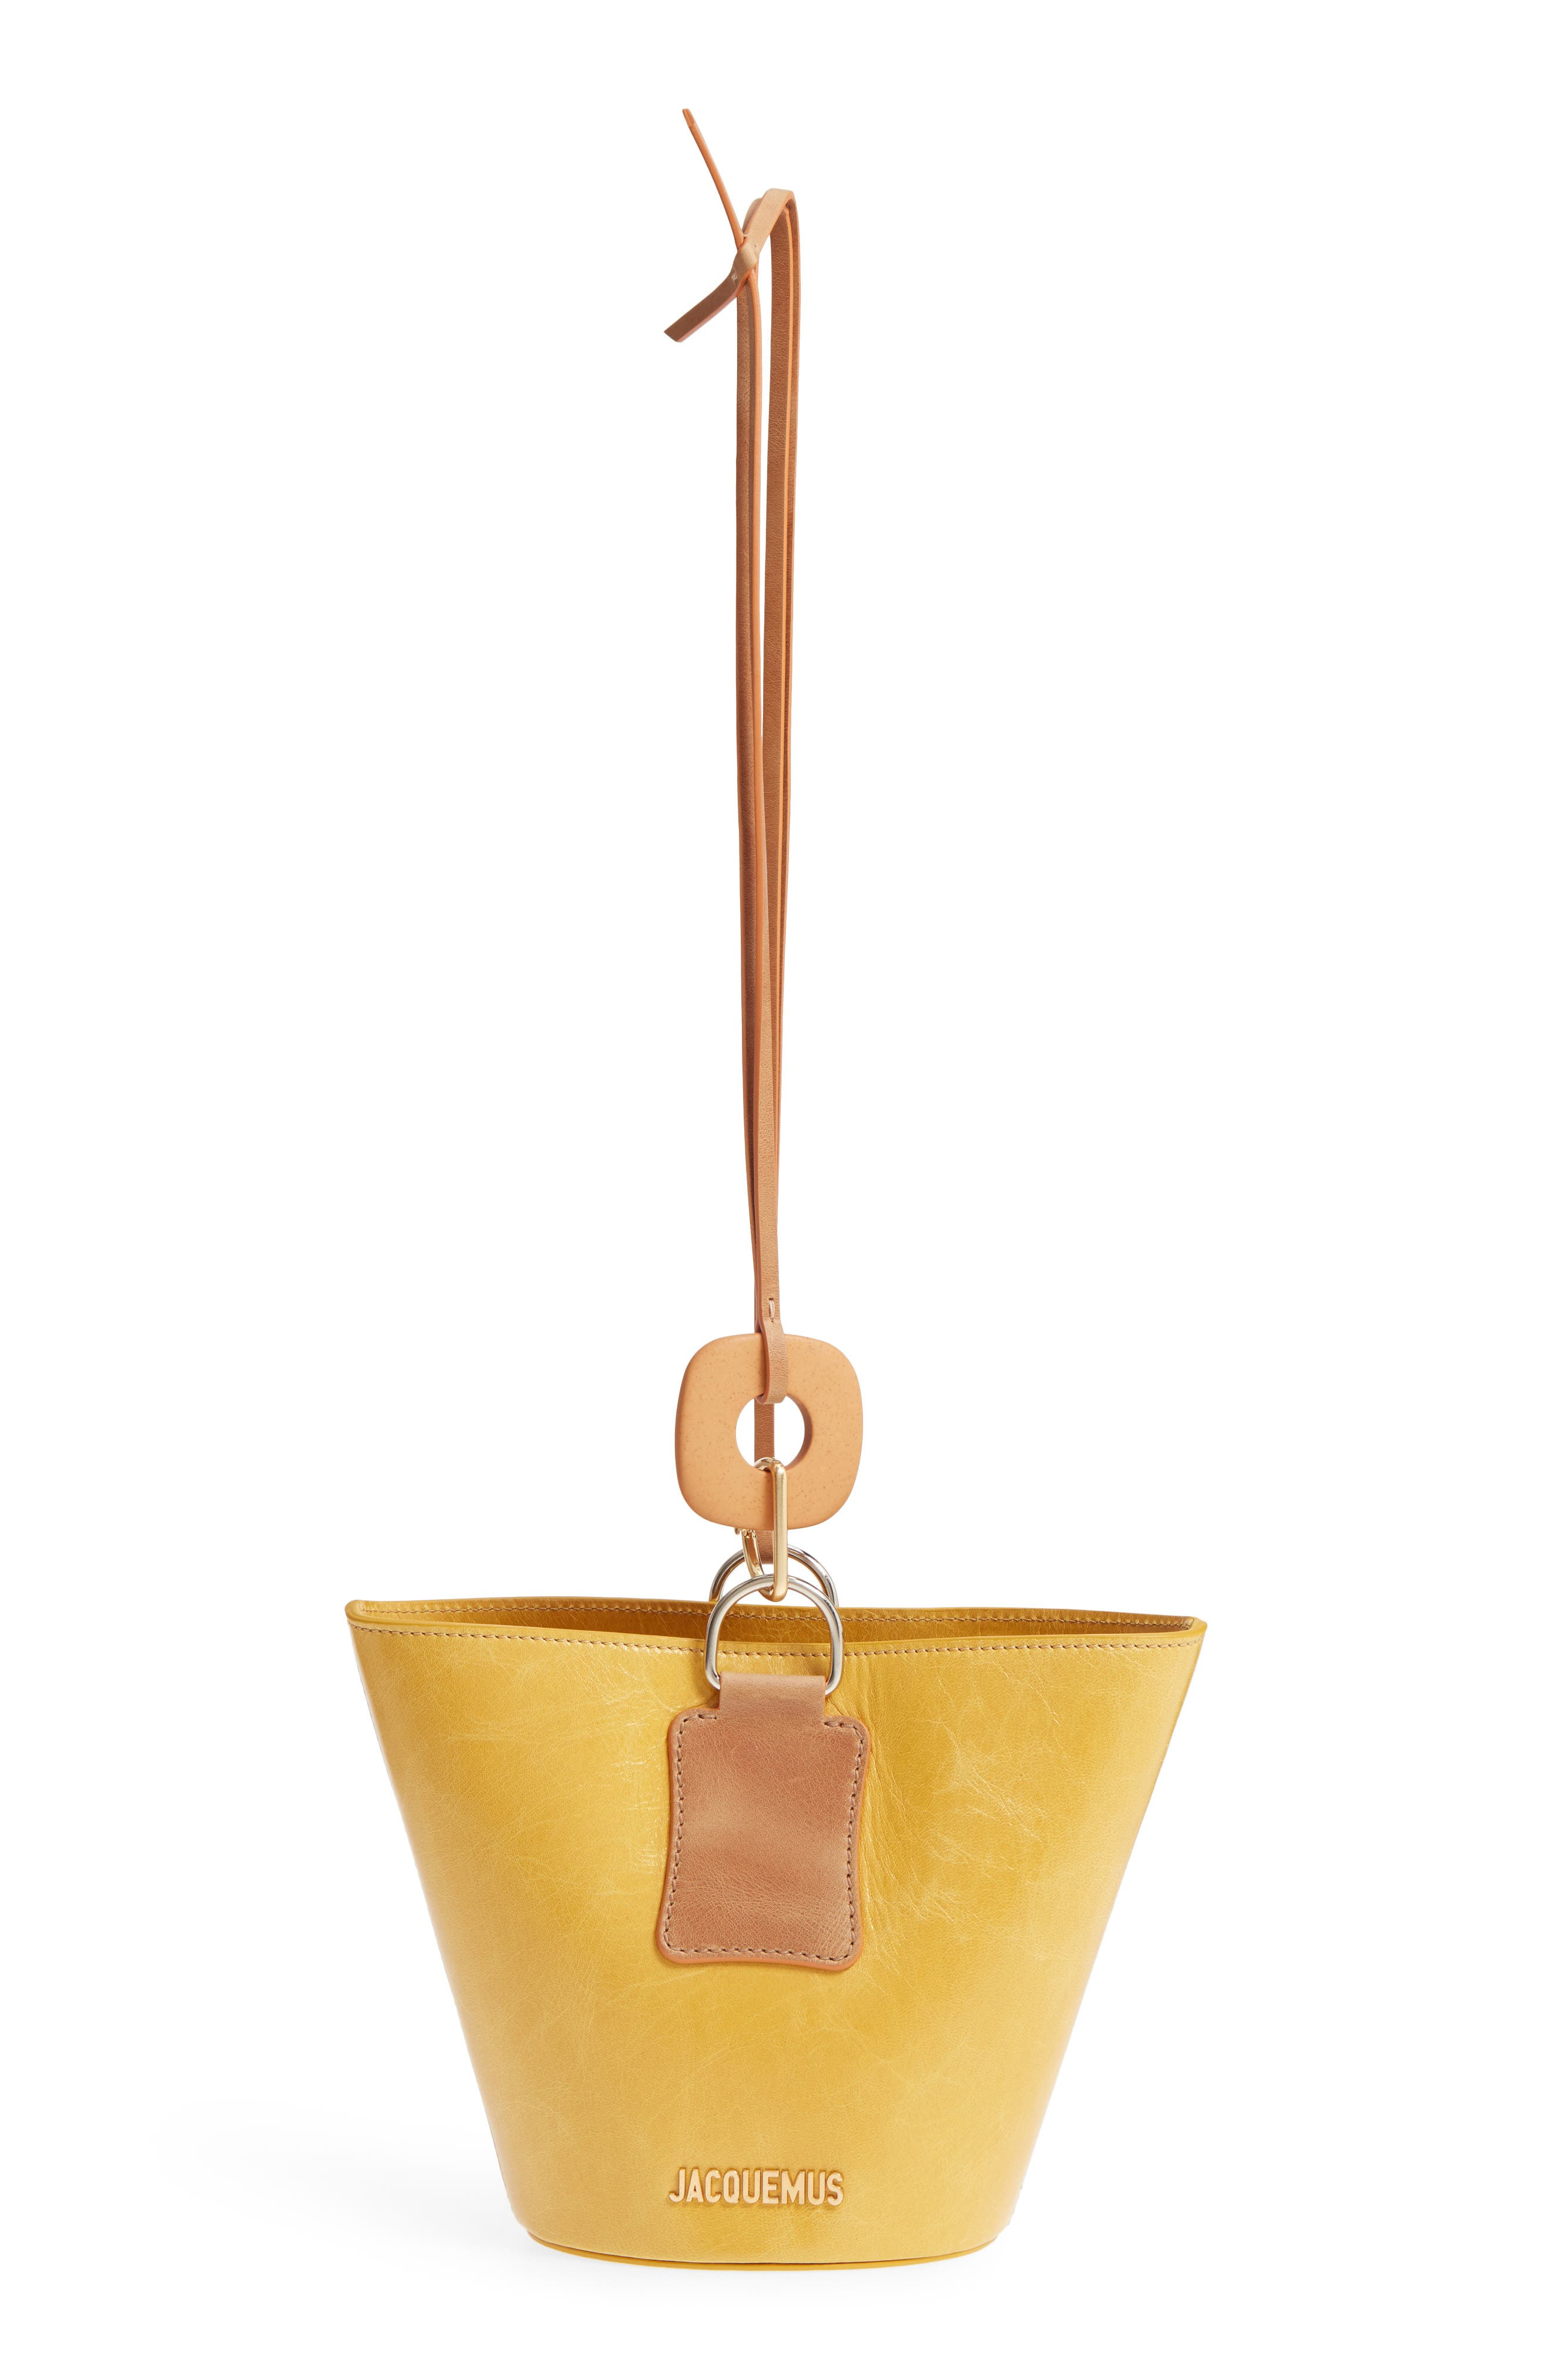 Jacquemus Le Sac Praia Bucket Bag